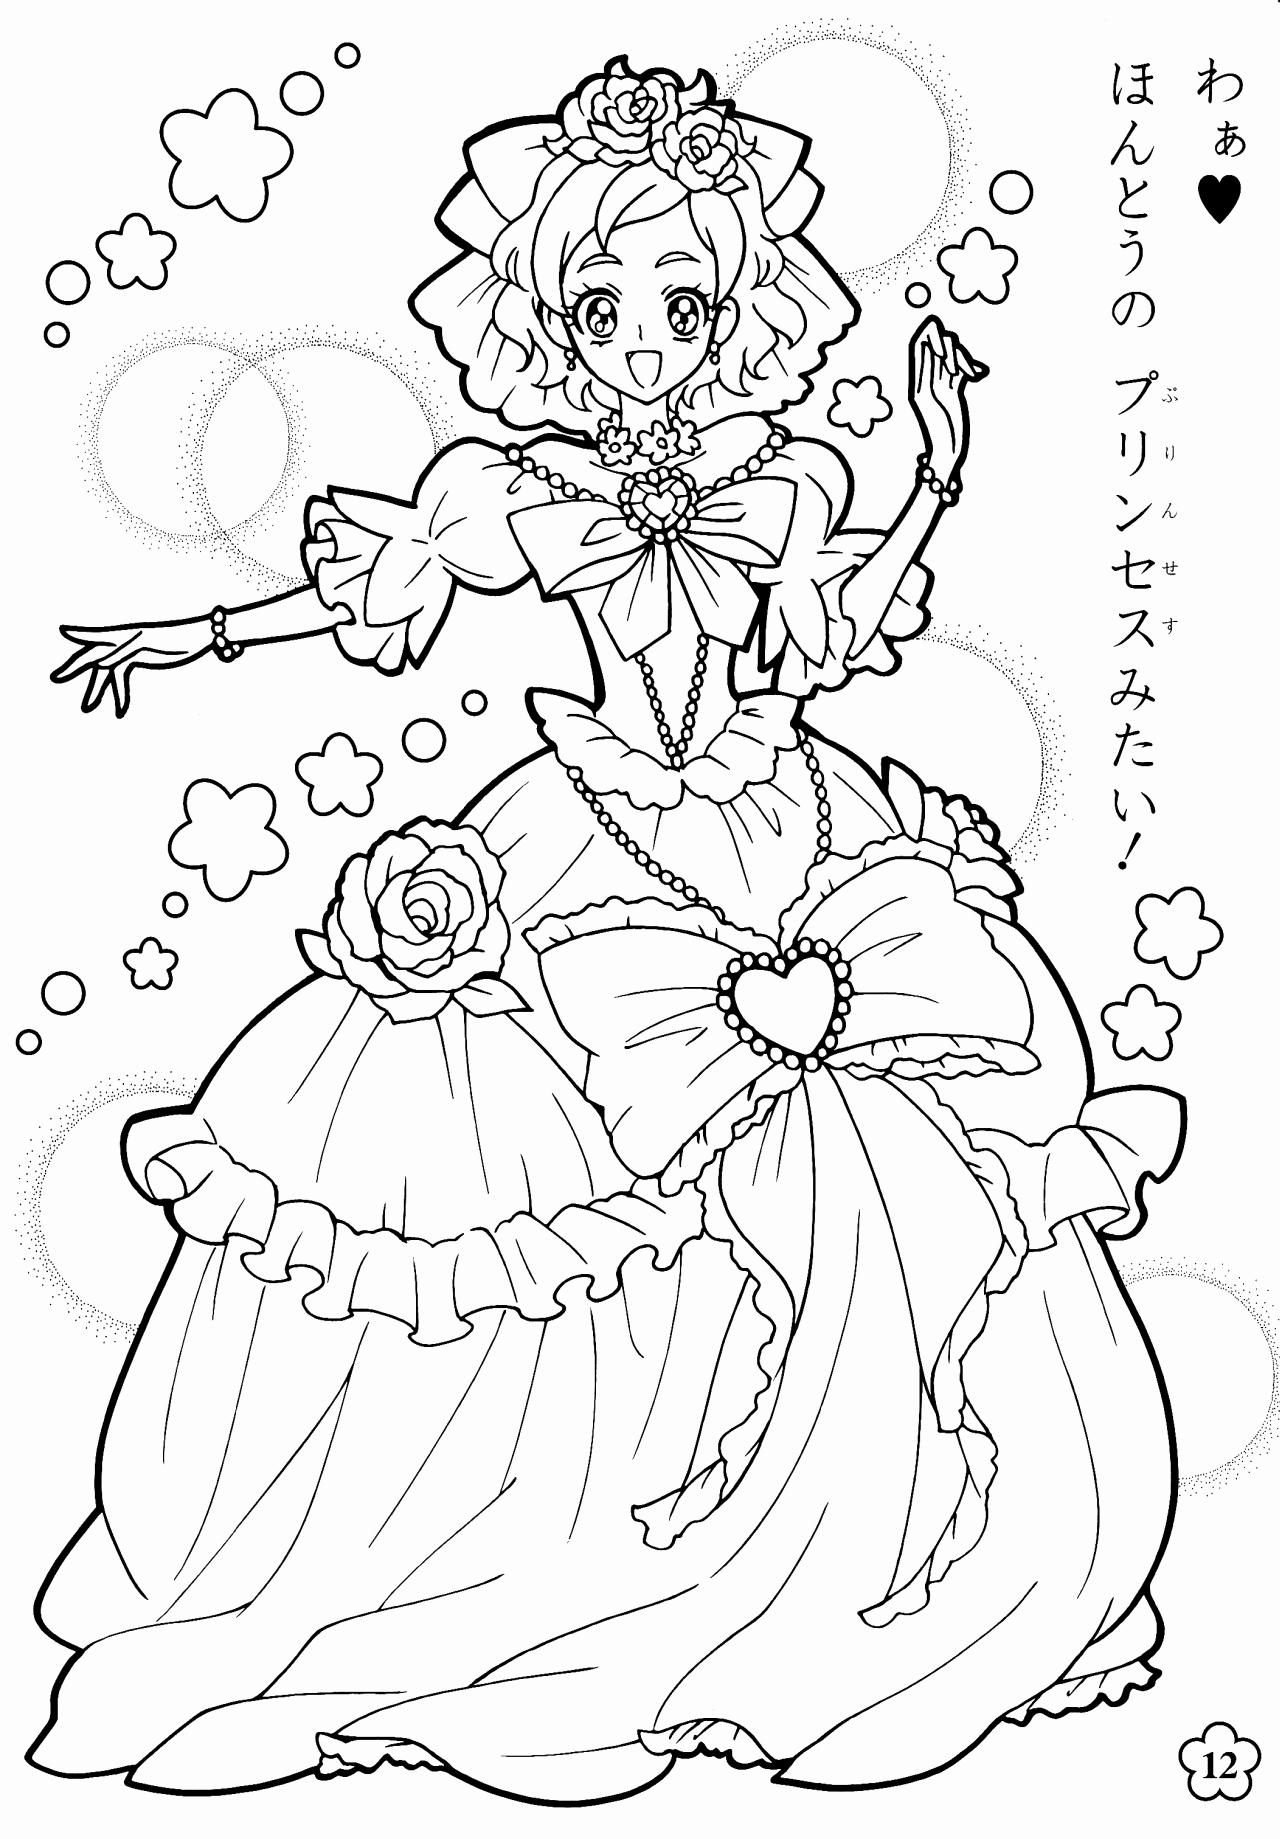 1280x1839 Princess Coloring Pictures To Print Beautiful Mahou Tsukai Precure